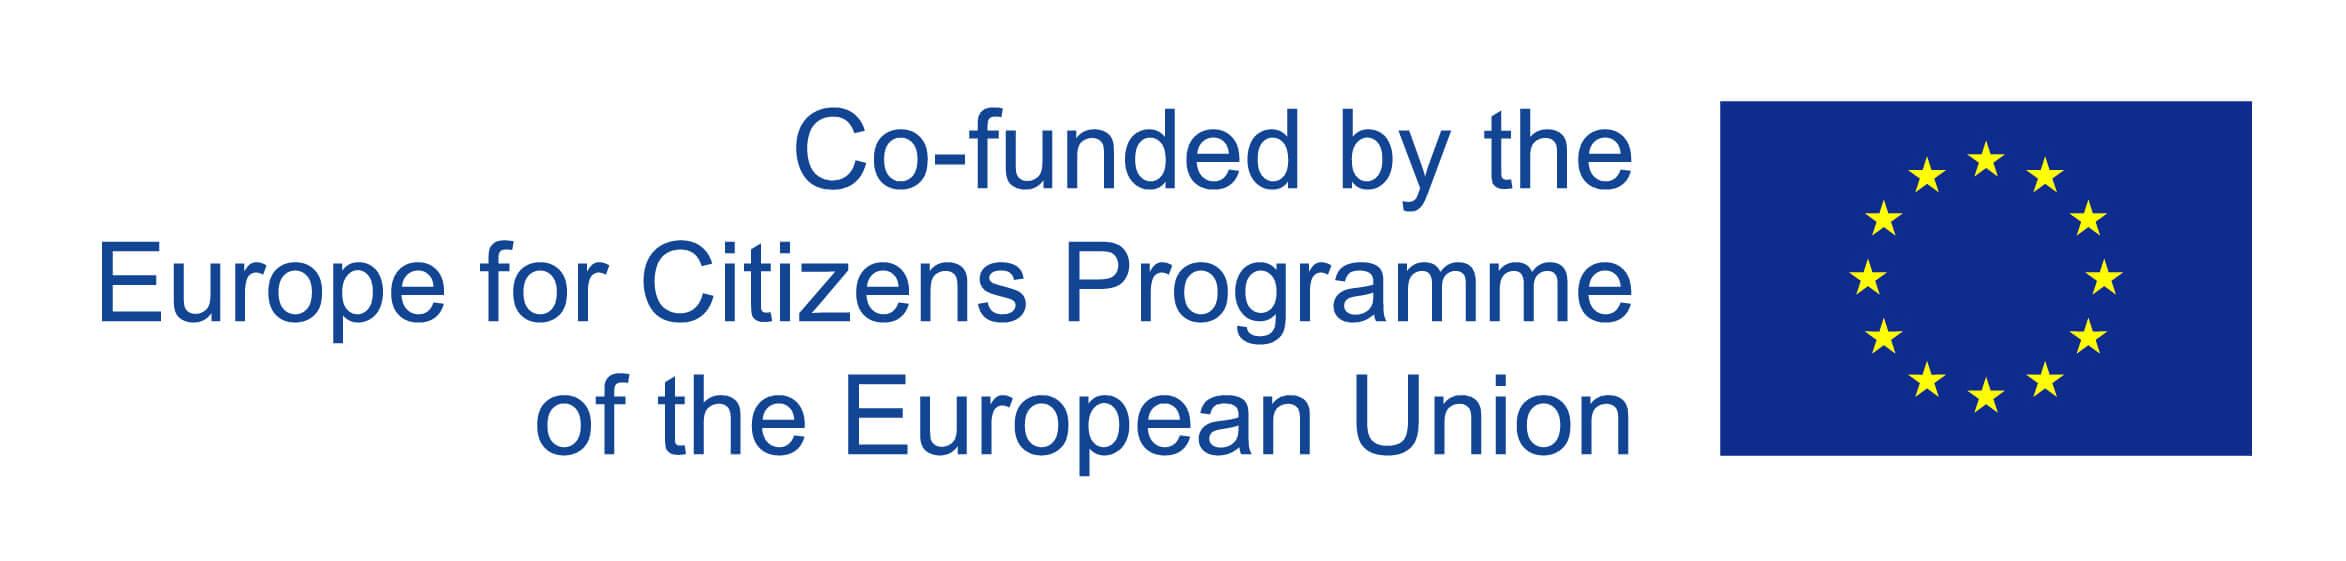 europe-citizens-funded-logo